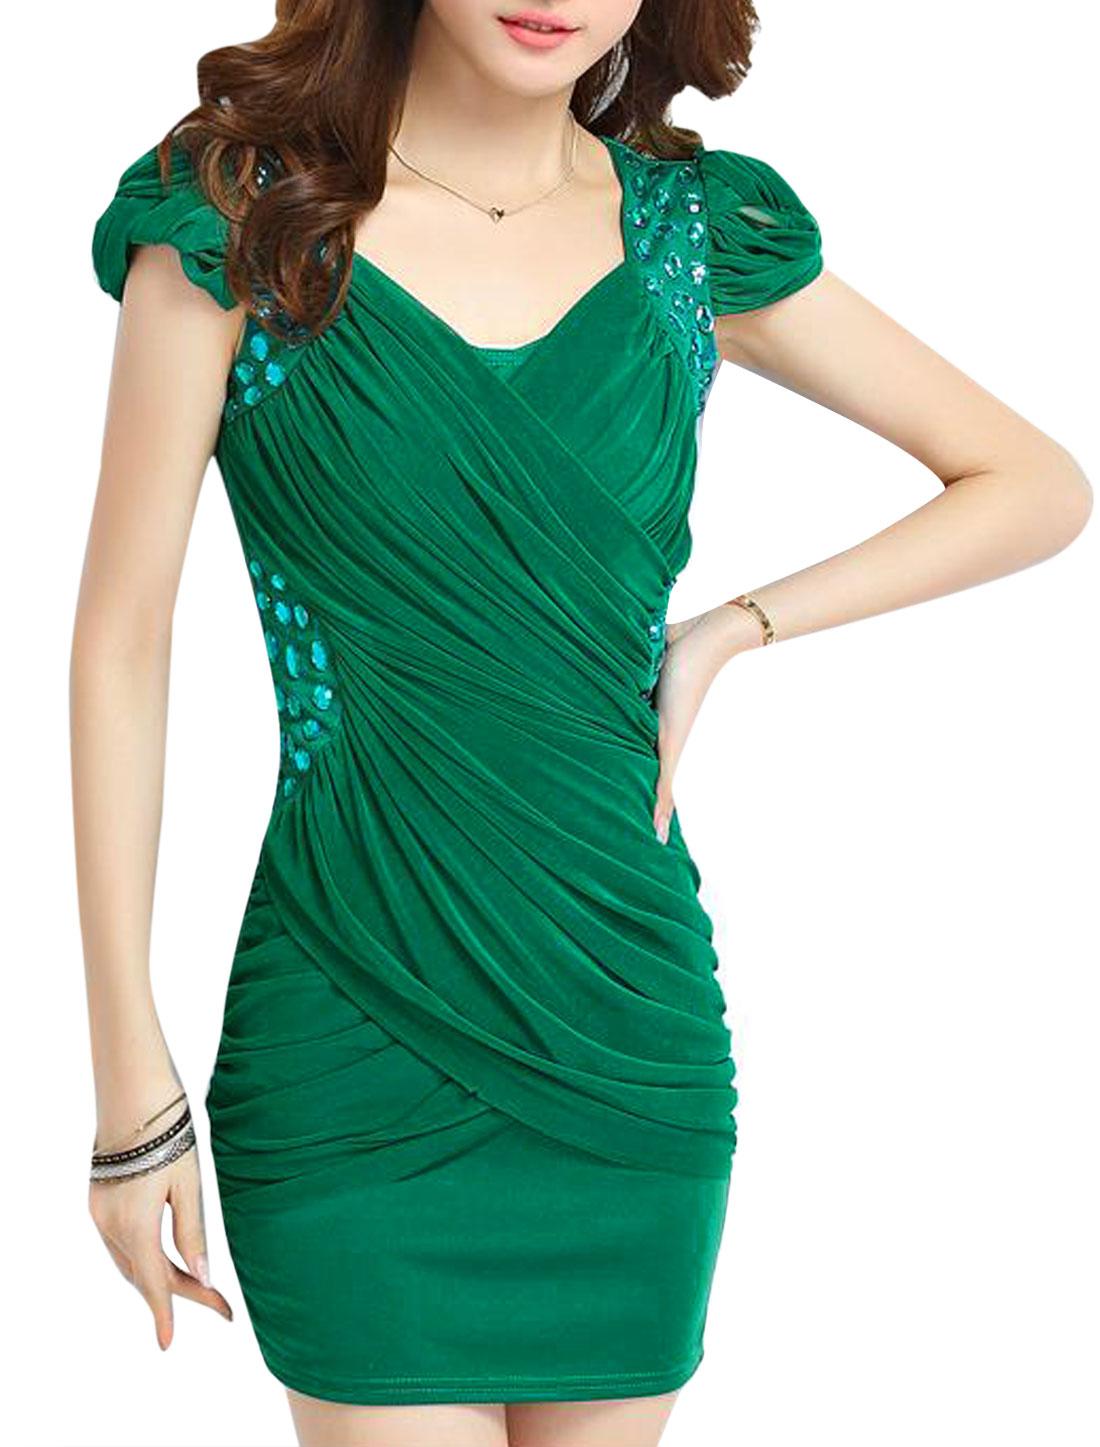 Lady Cap Sleeve Fake Crystal Decor Mesh Panel Bodycon Dress Dark Green M